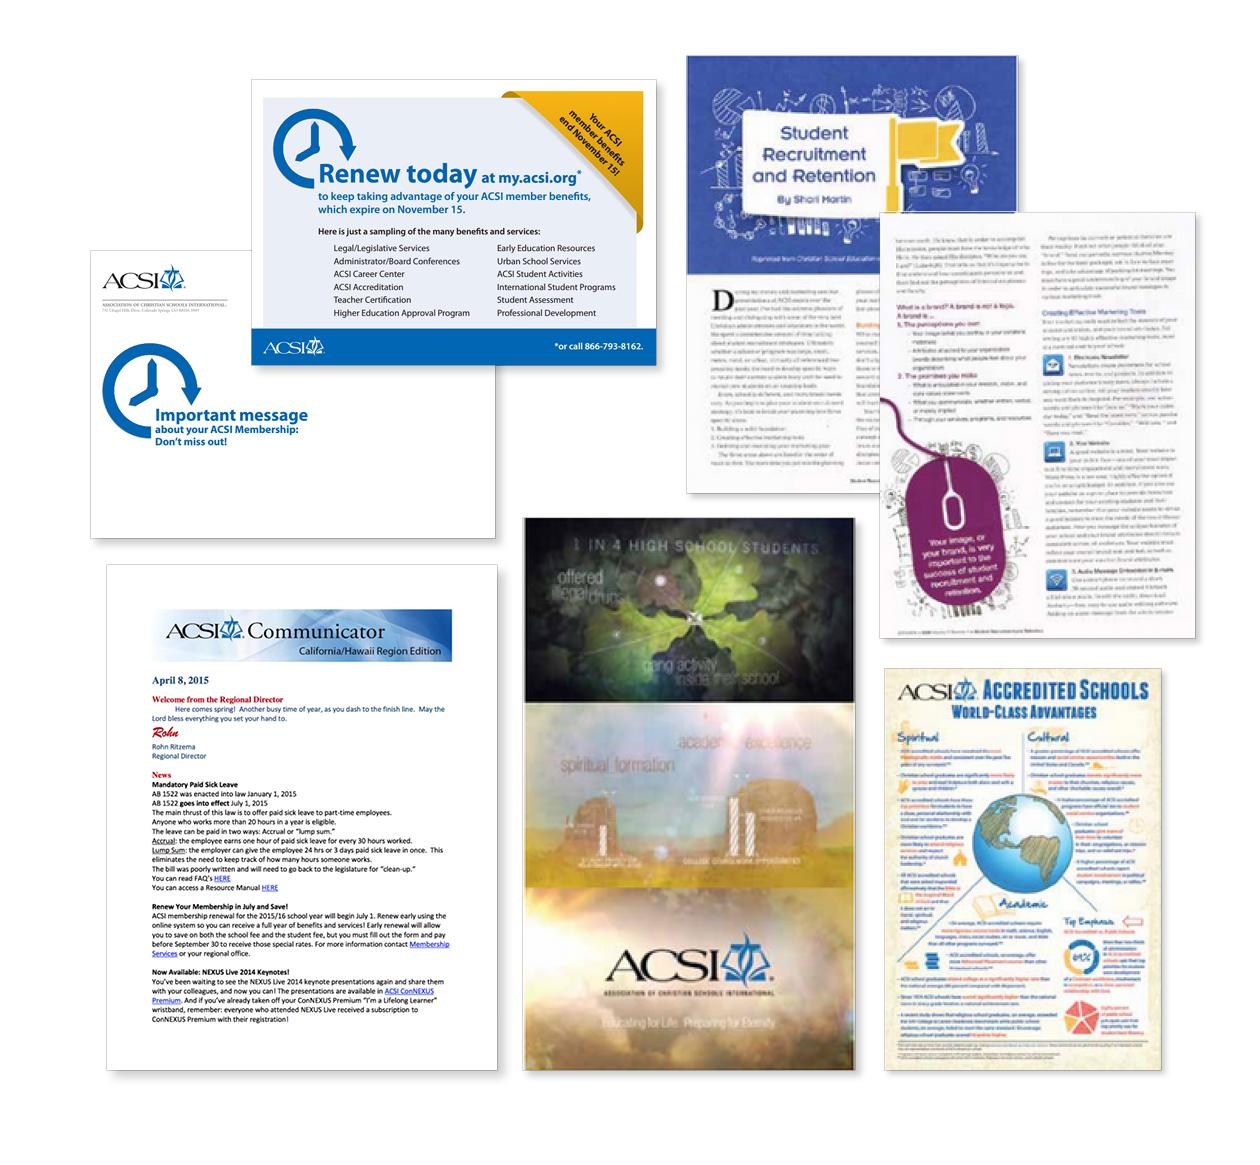 CaseStudy_ACSI3.jpg